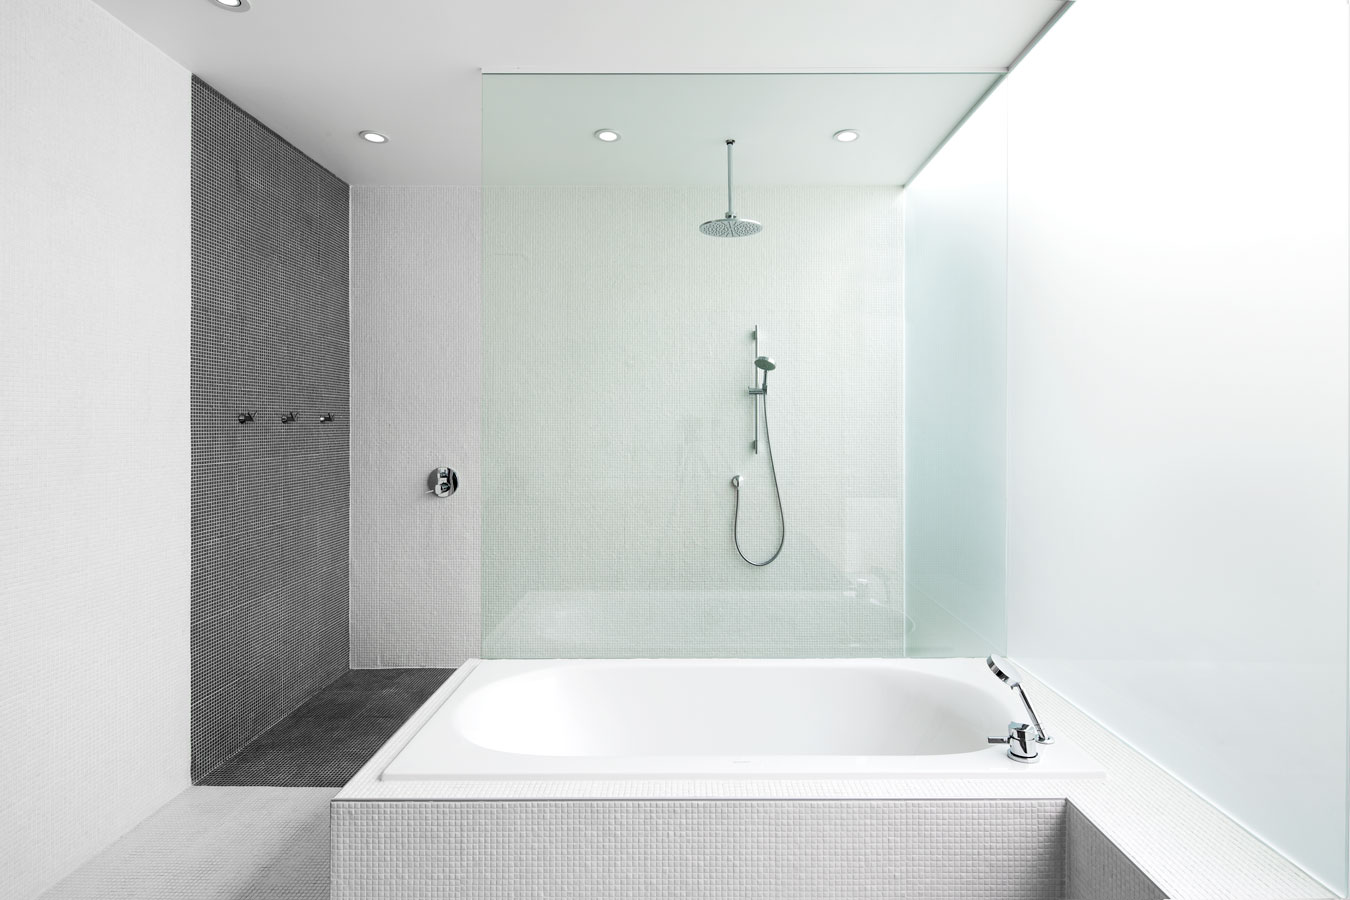 Baño Azulejos Blancos:Alexandra Residence